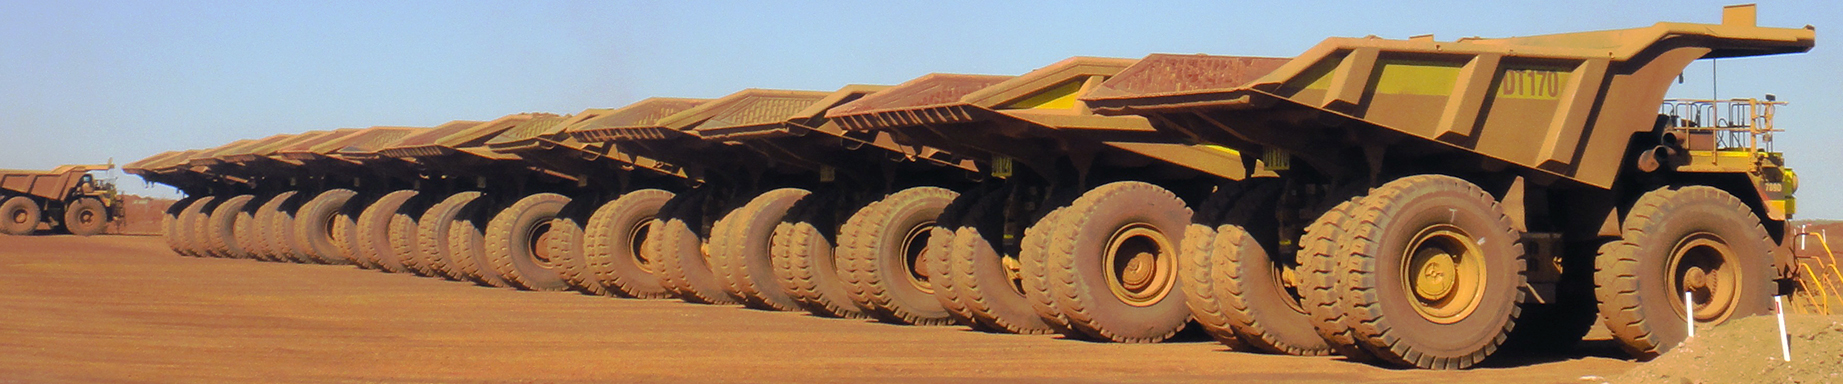 Luan OTR Tires